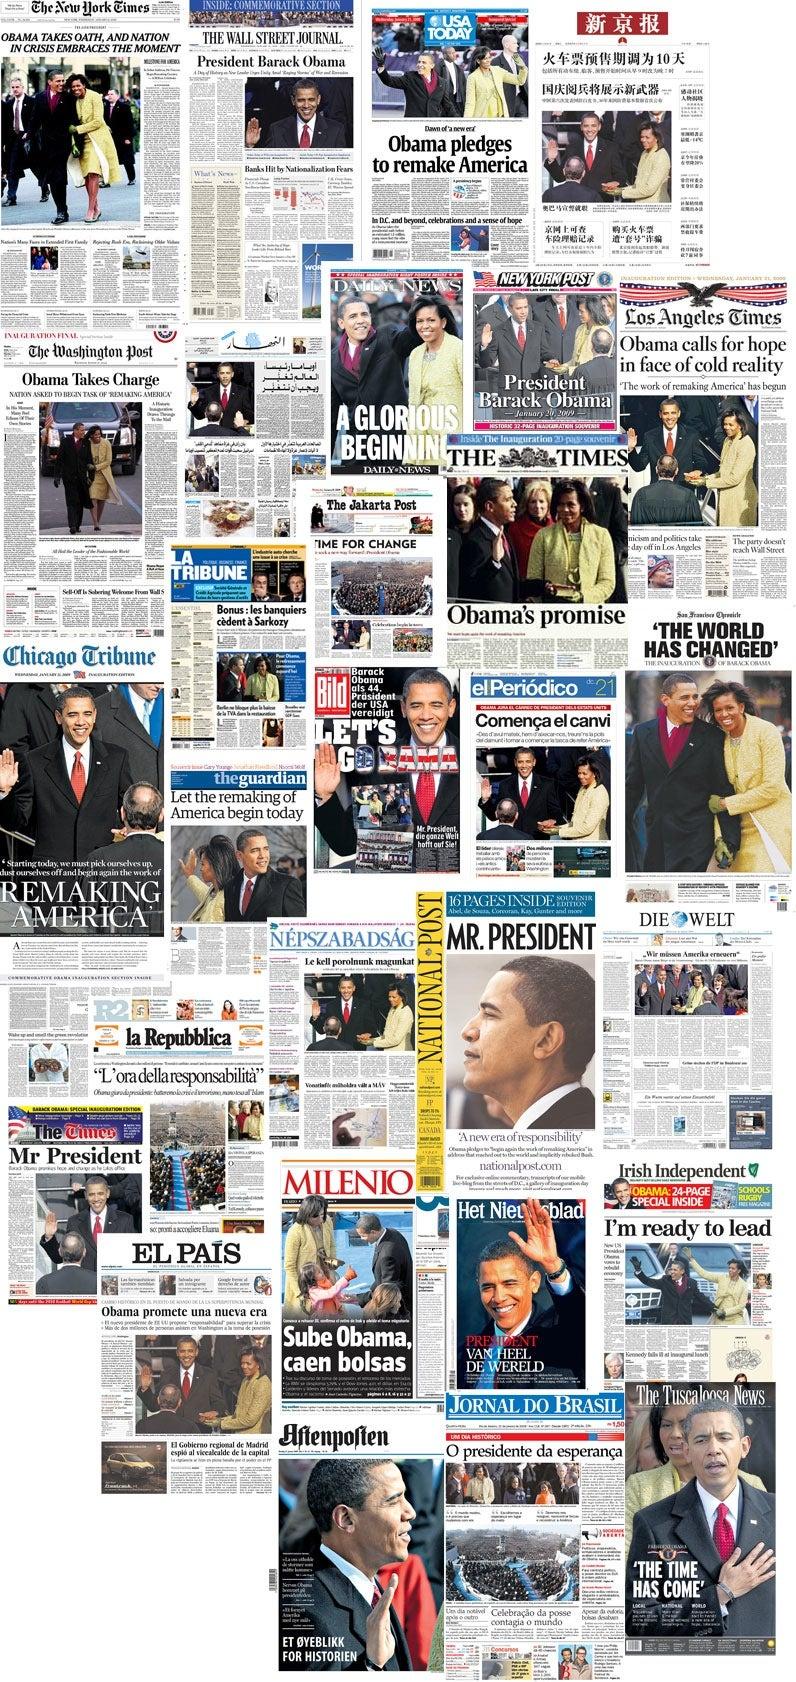 Obama Seizes World's A1 Supply